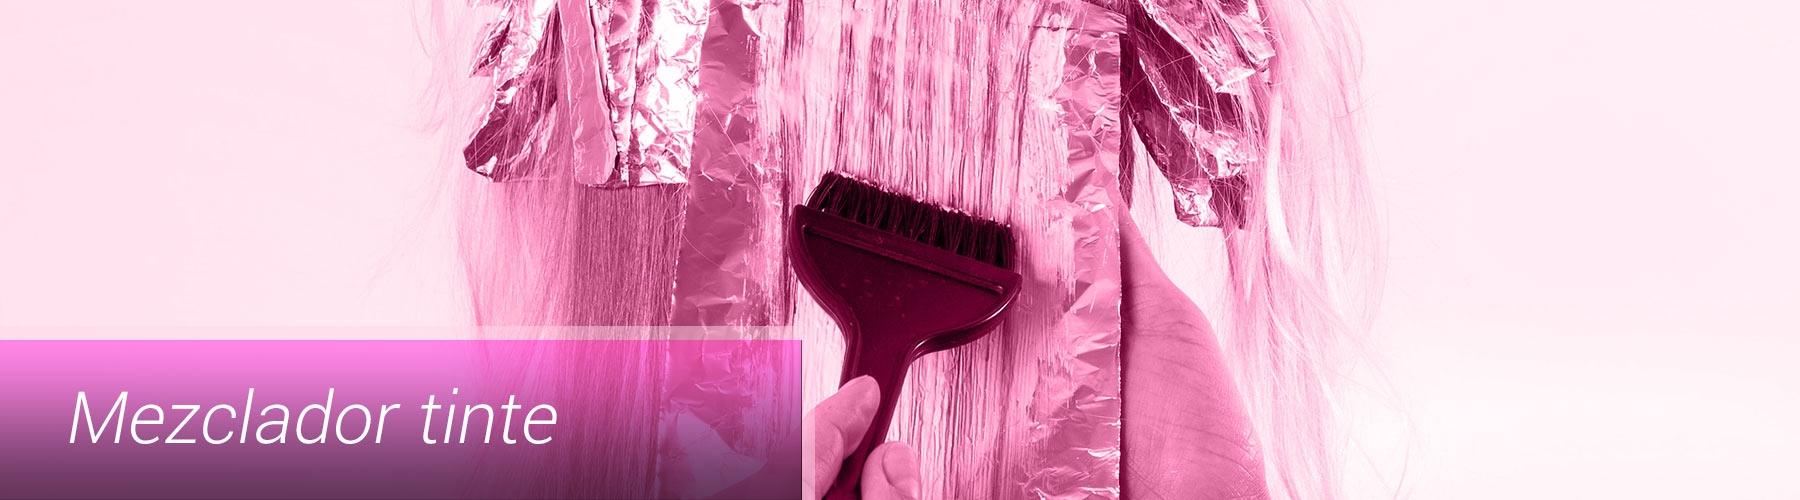 Mezclador tinte recargable